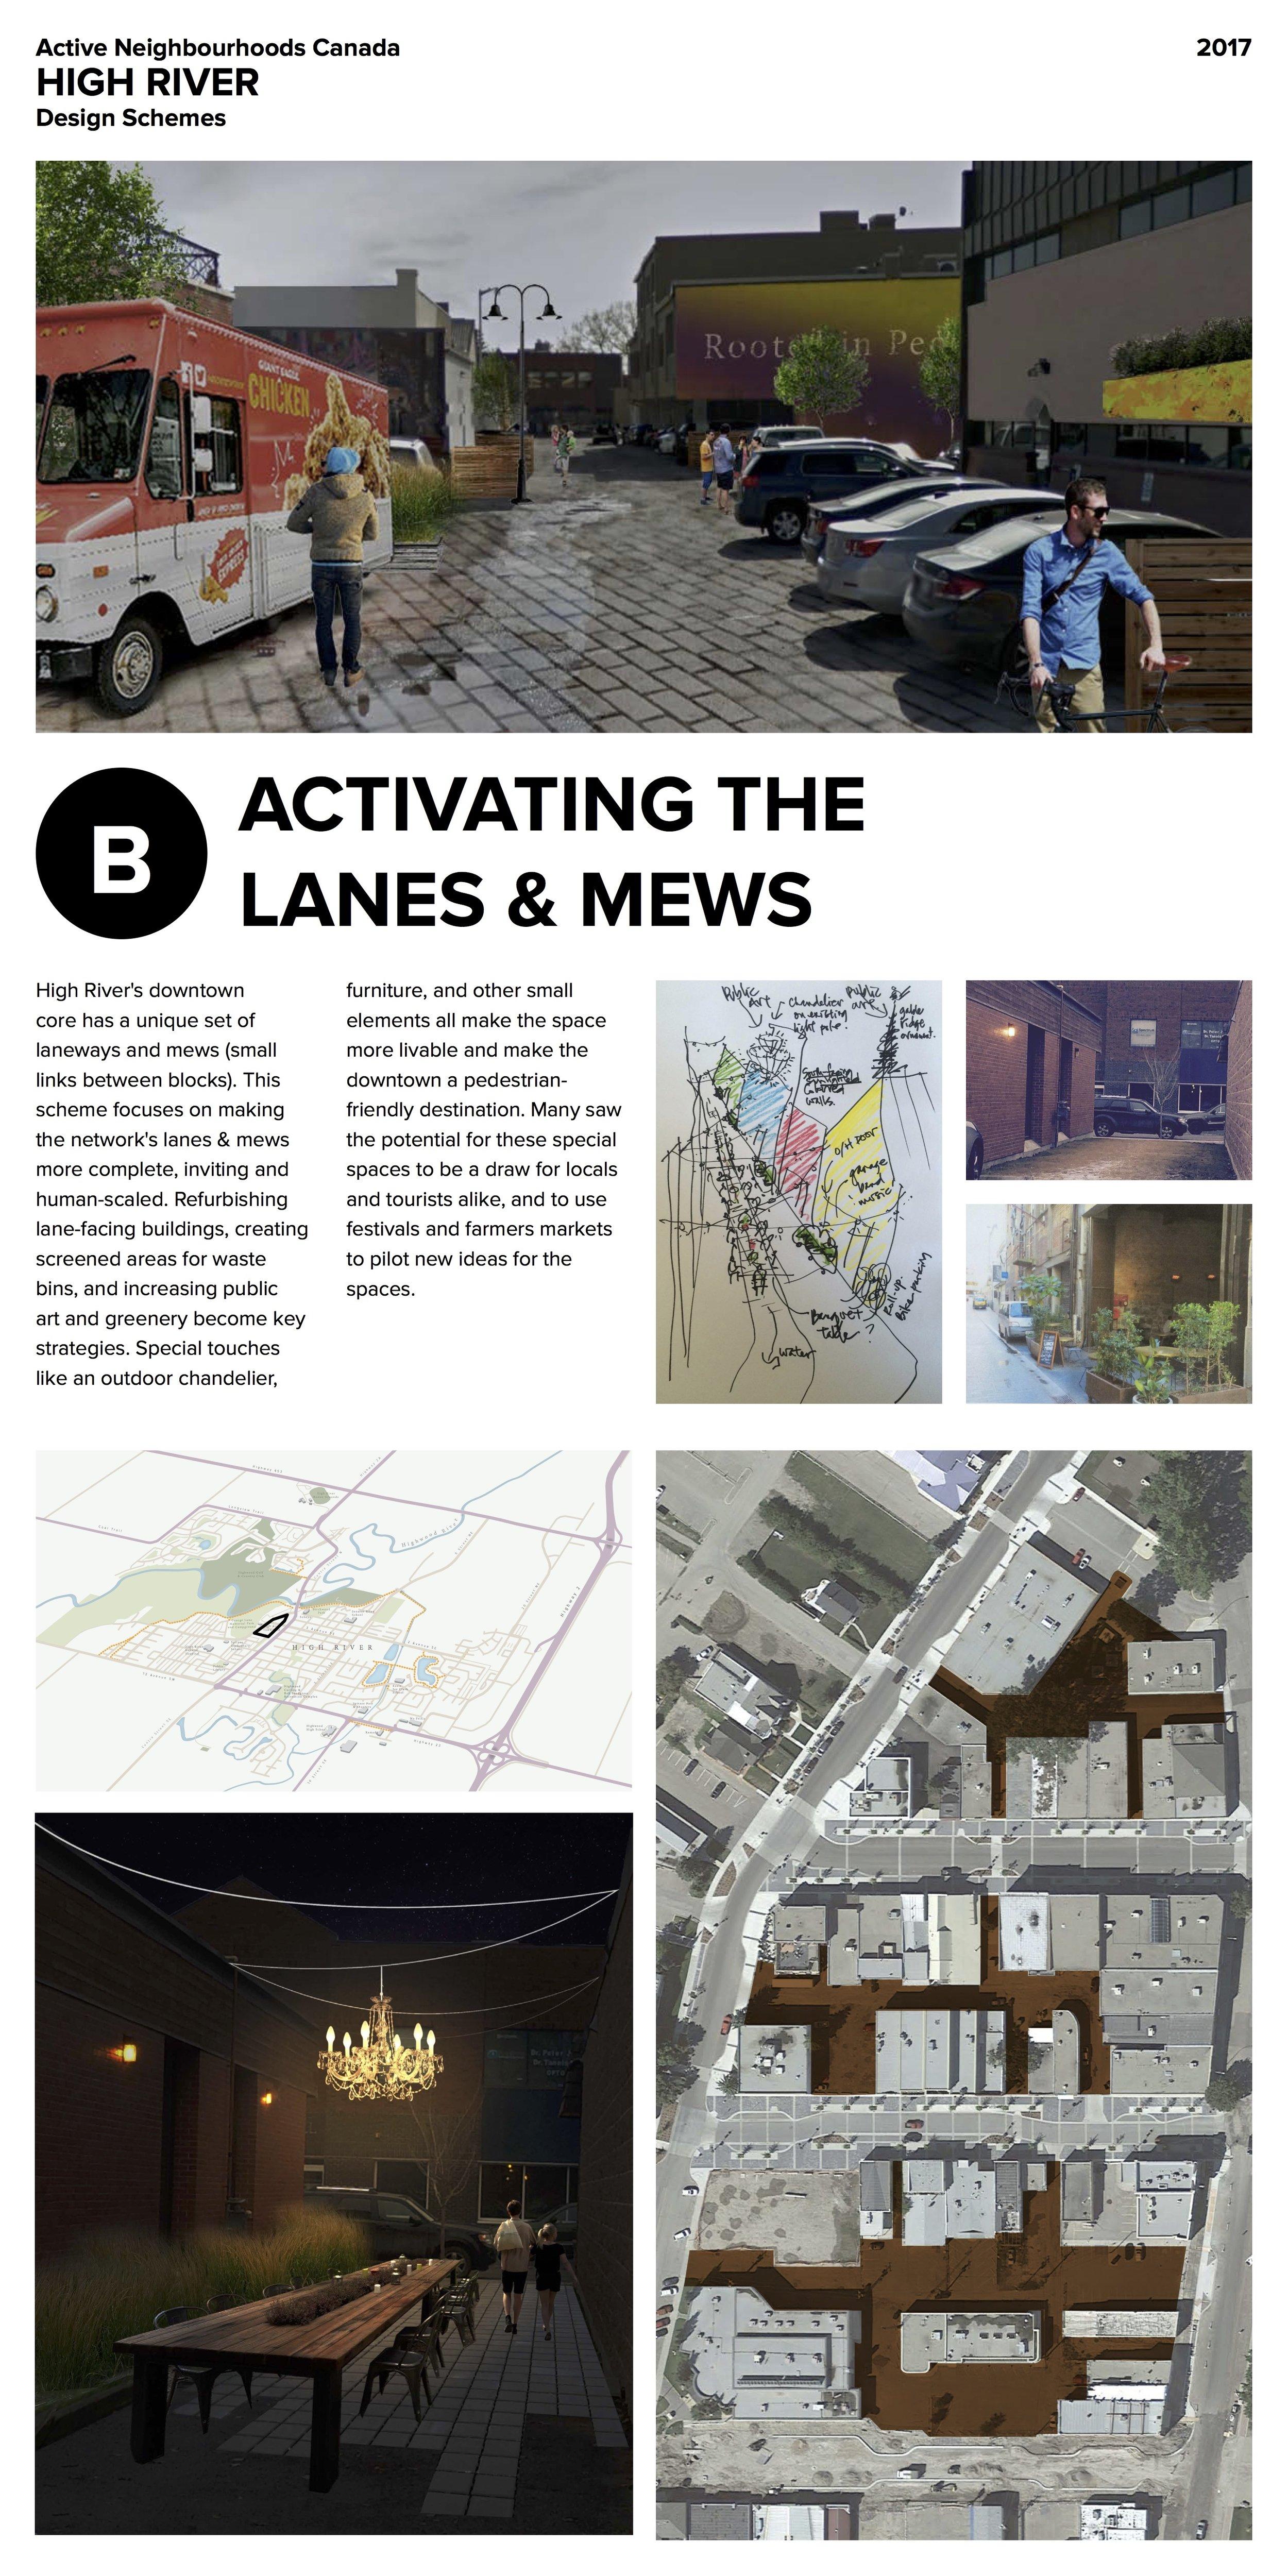 High River Schemes page 3.jpg